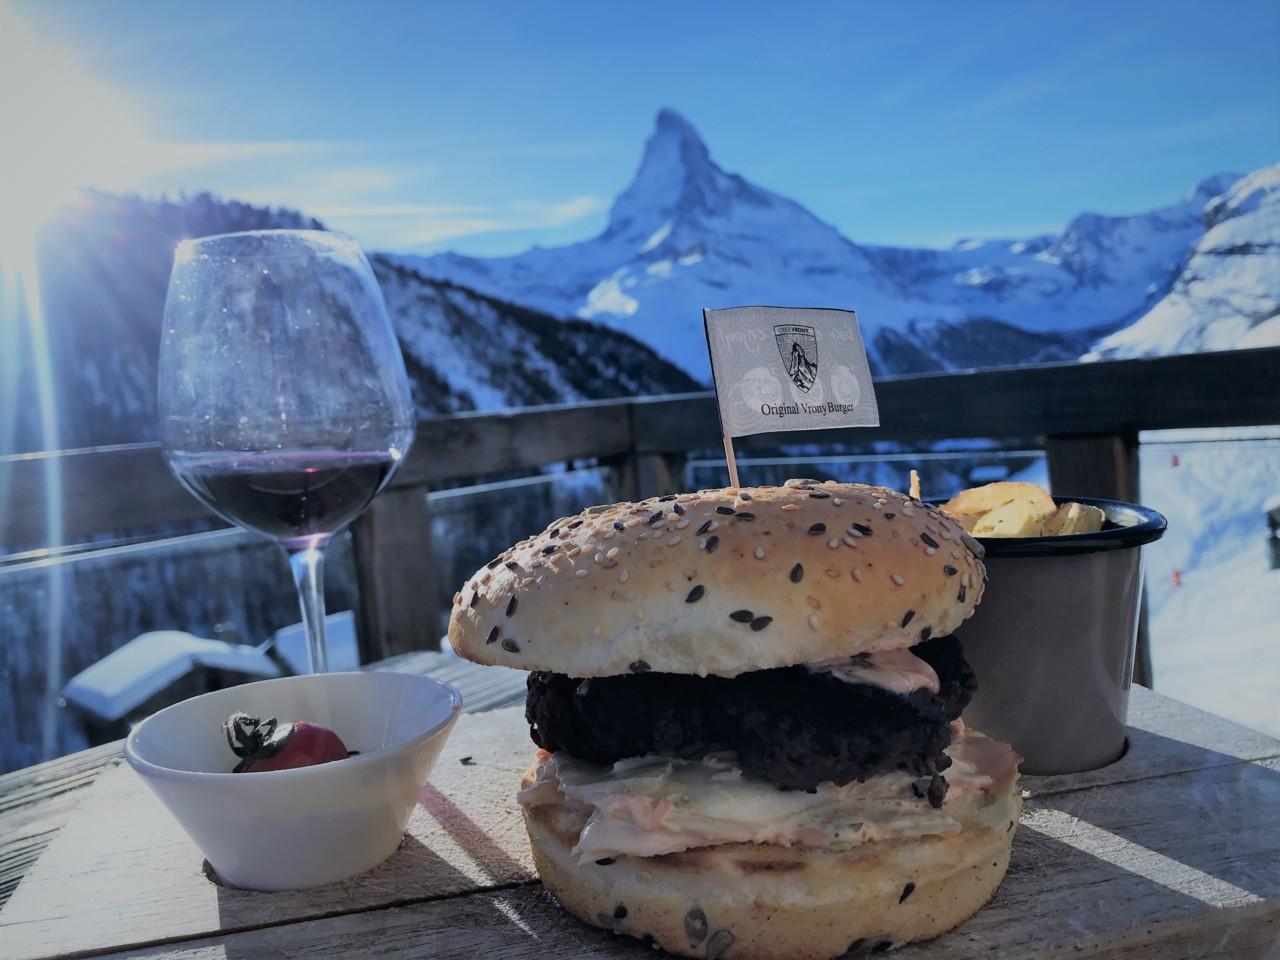 chez_vrony_restaurant_zermatt_burger_geheimtipp